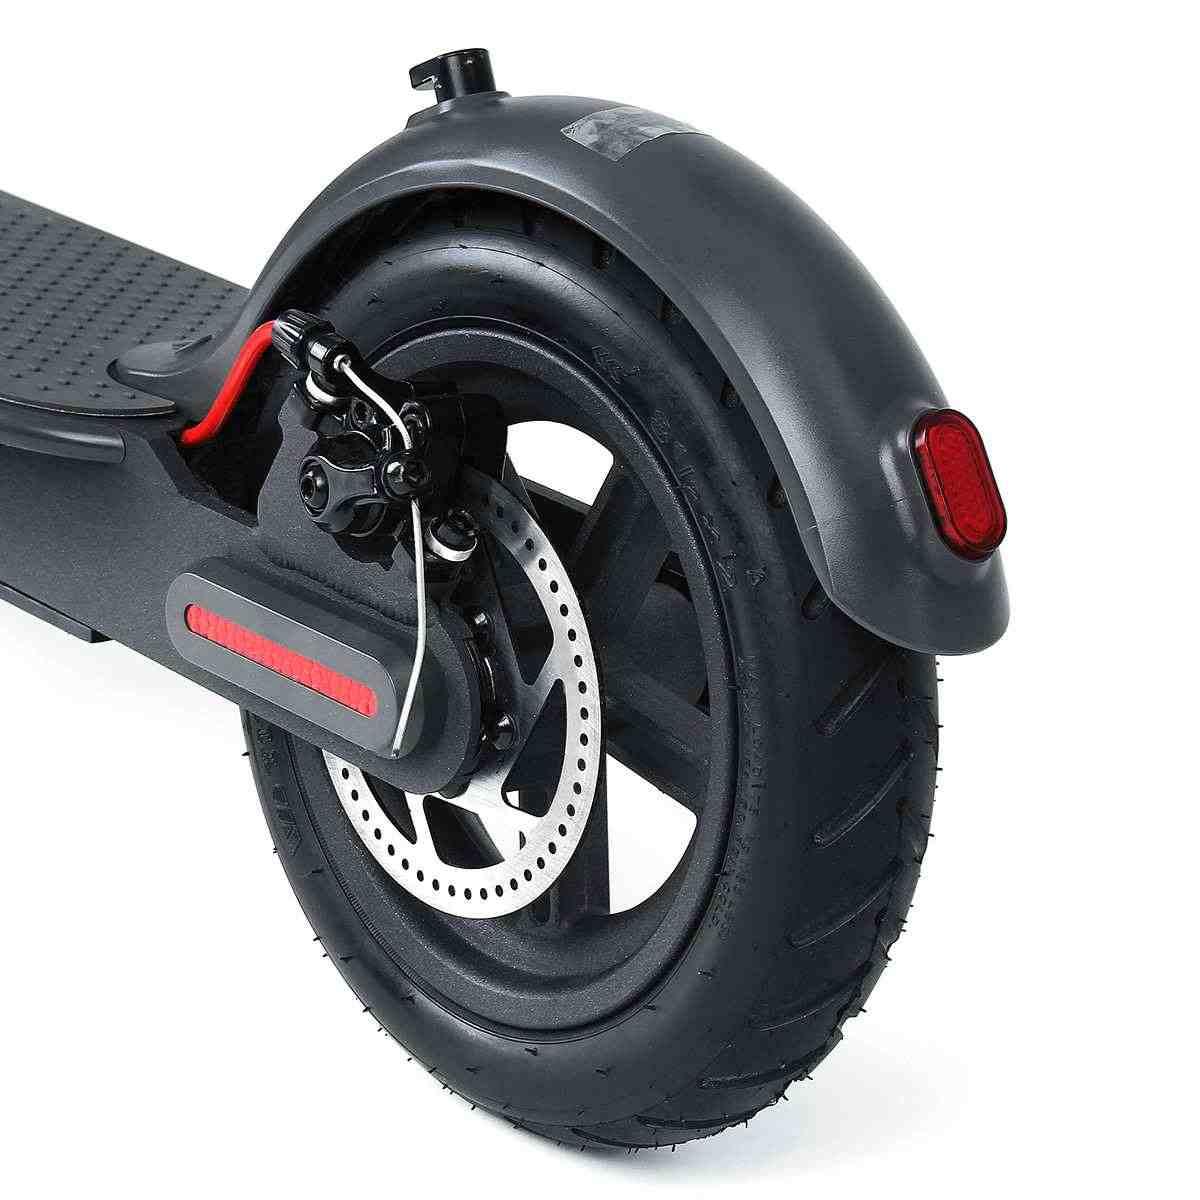 350W bicicleta eléctrica para adultos, bicicleta eléctrica plegable inteligente, tabla larga, monopatín, bicicleta eléctrica con luz LED, 2 ruedas